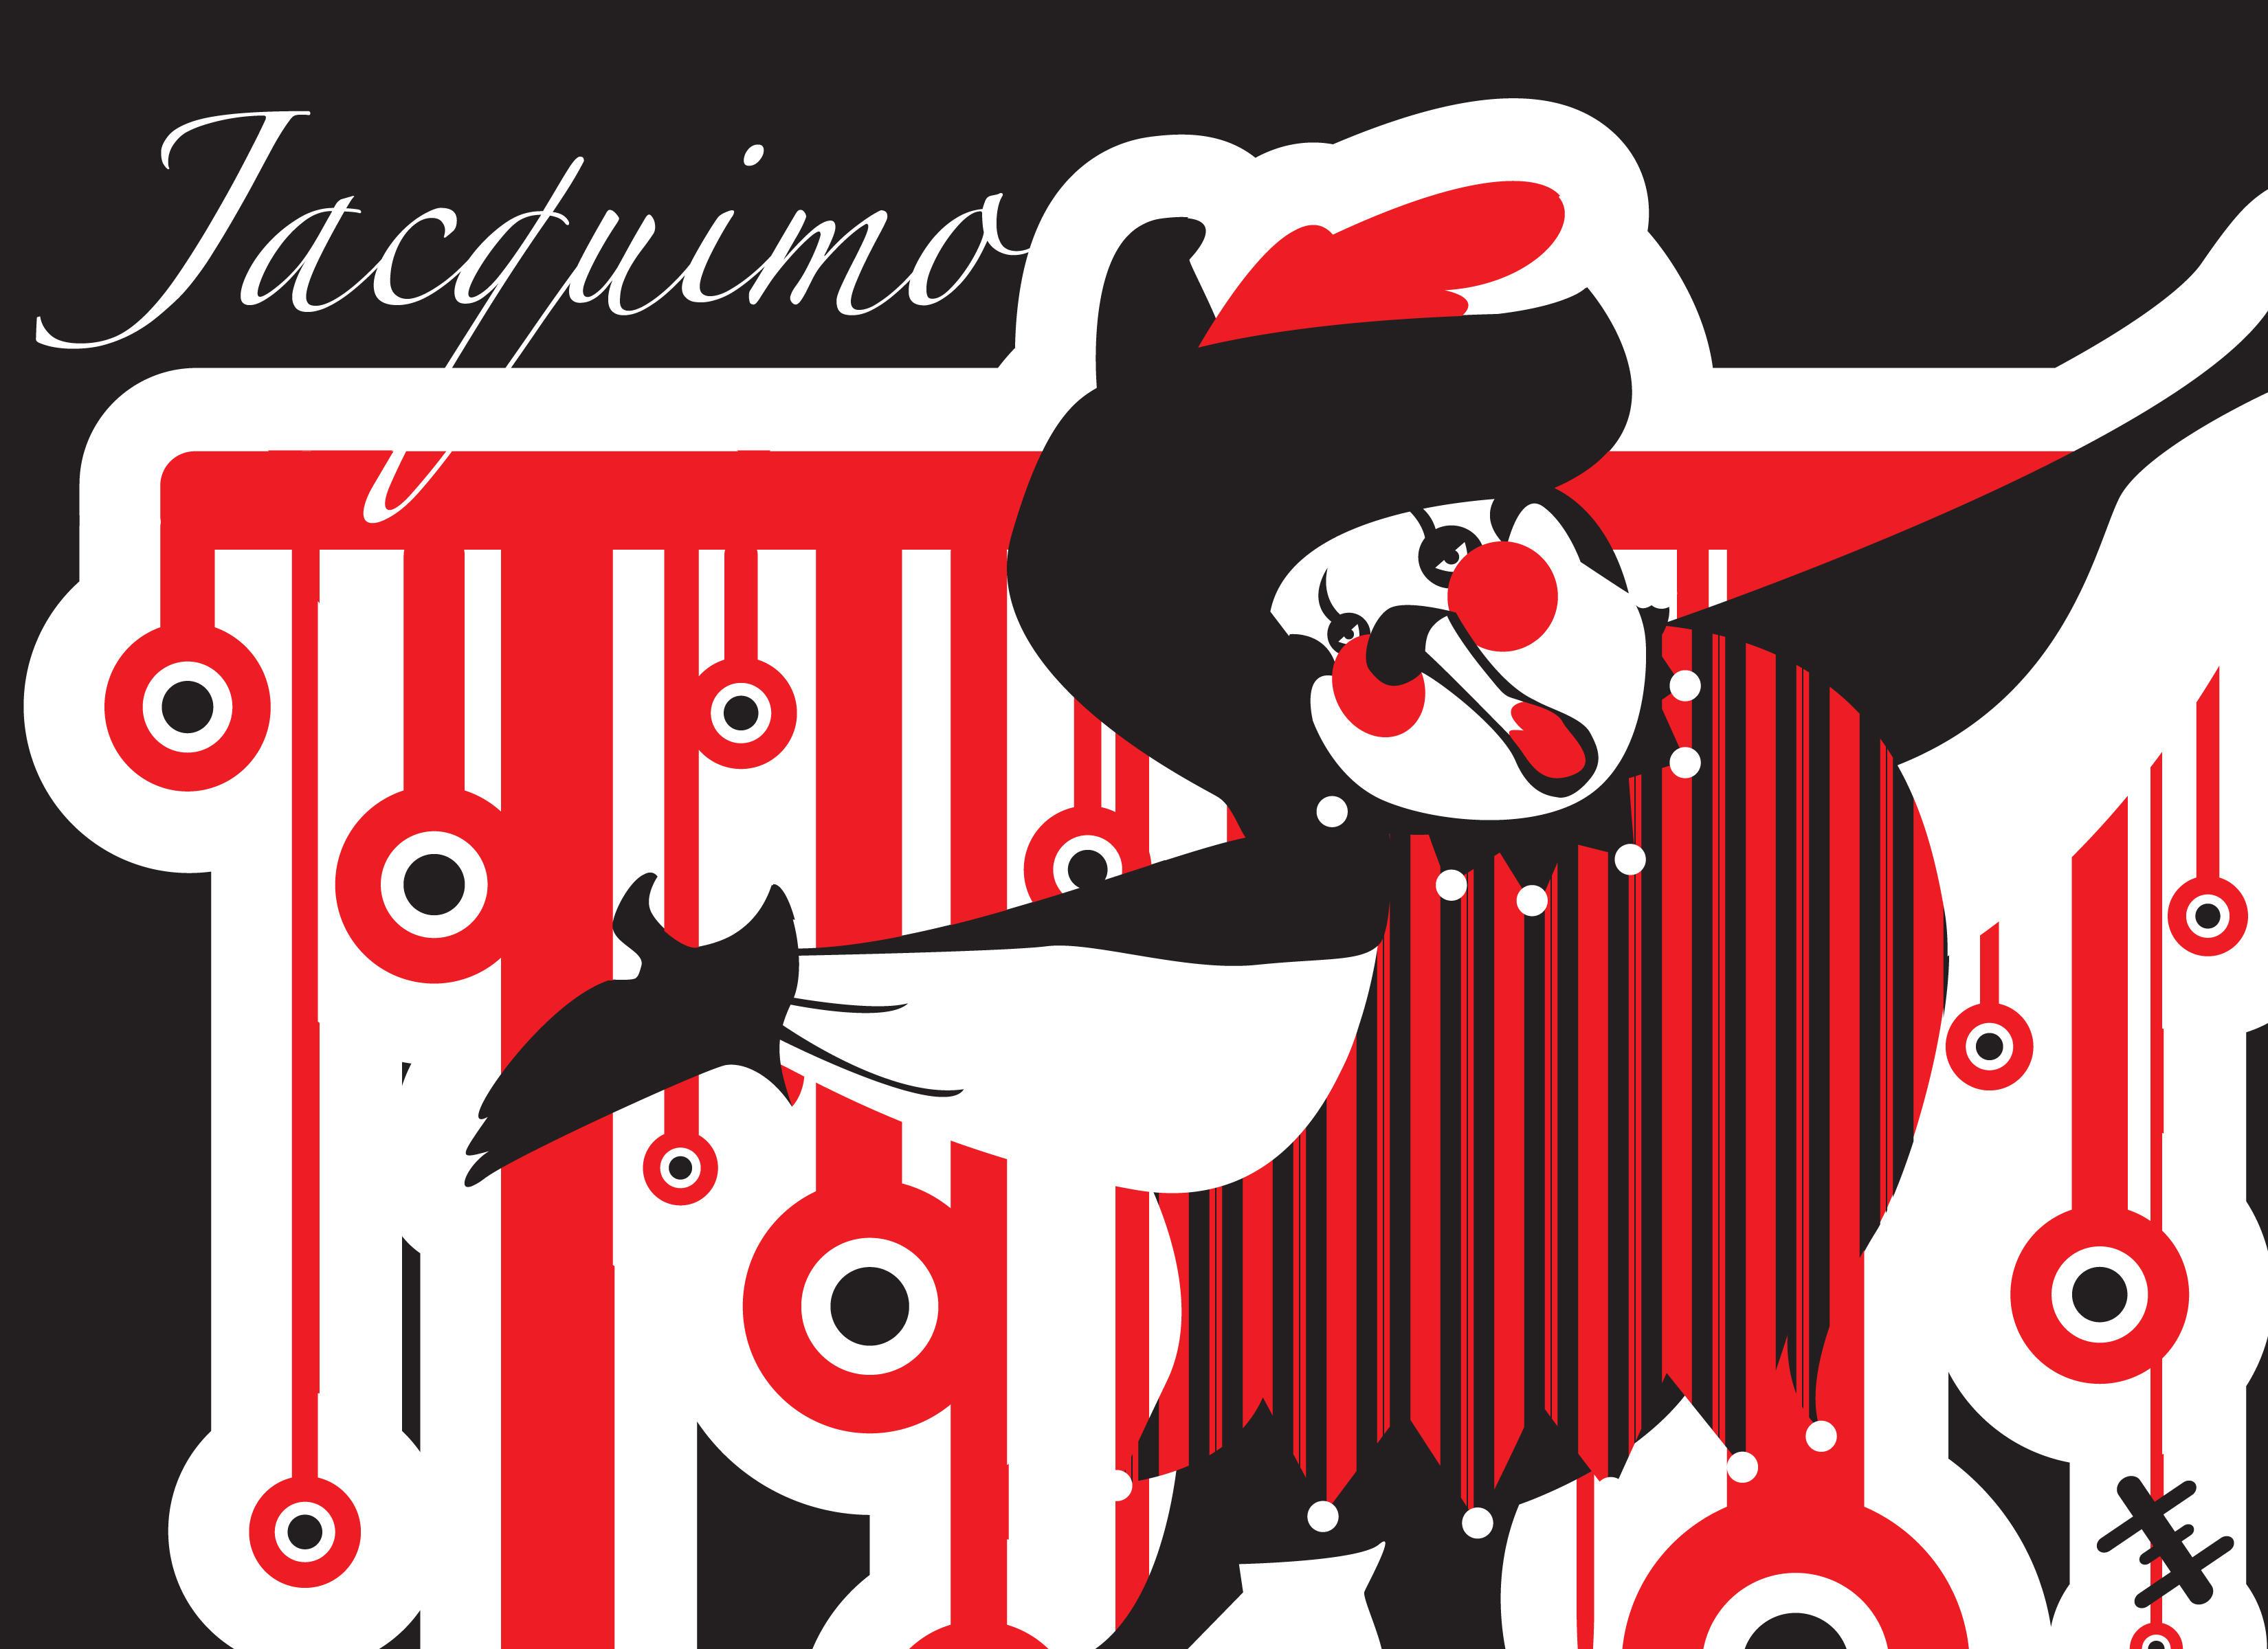 Jacquimo by phantomonex